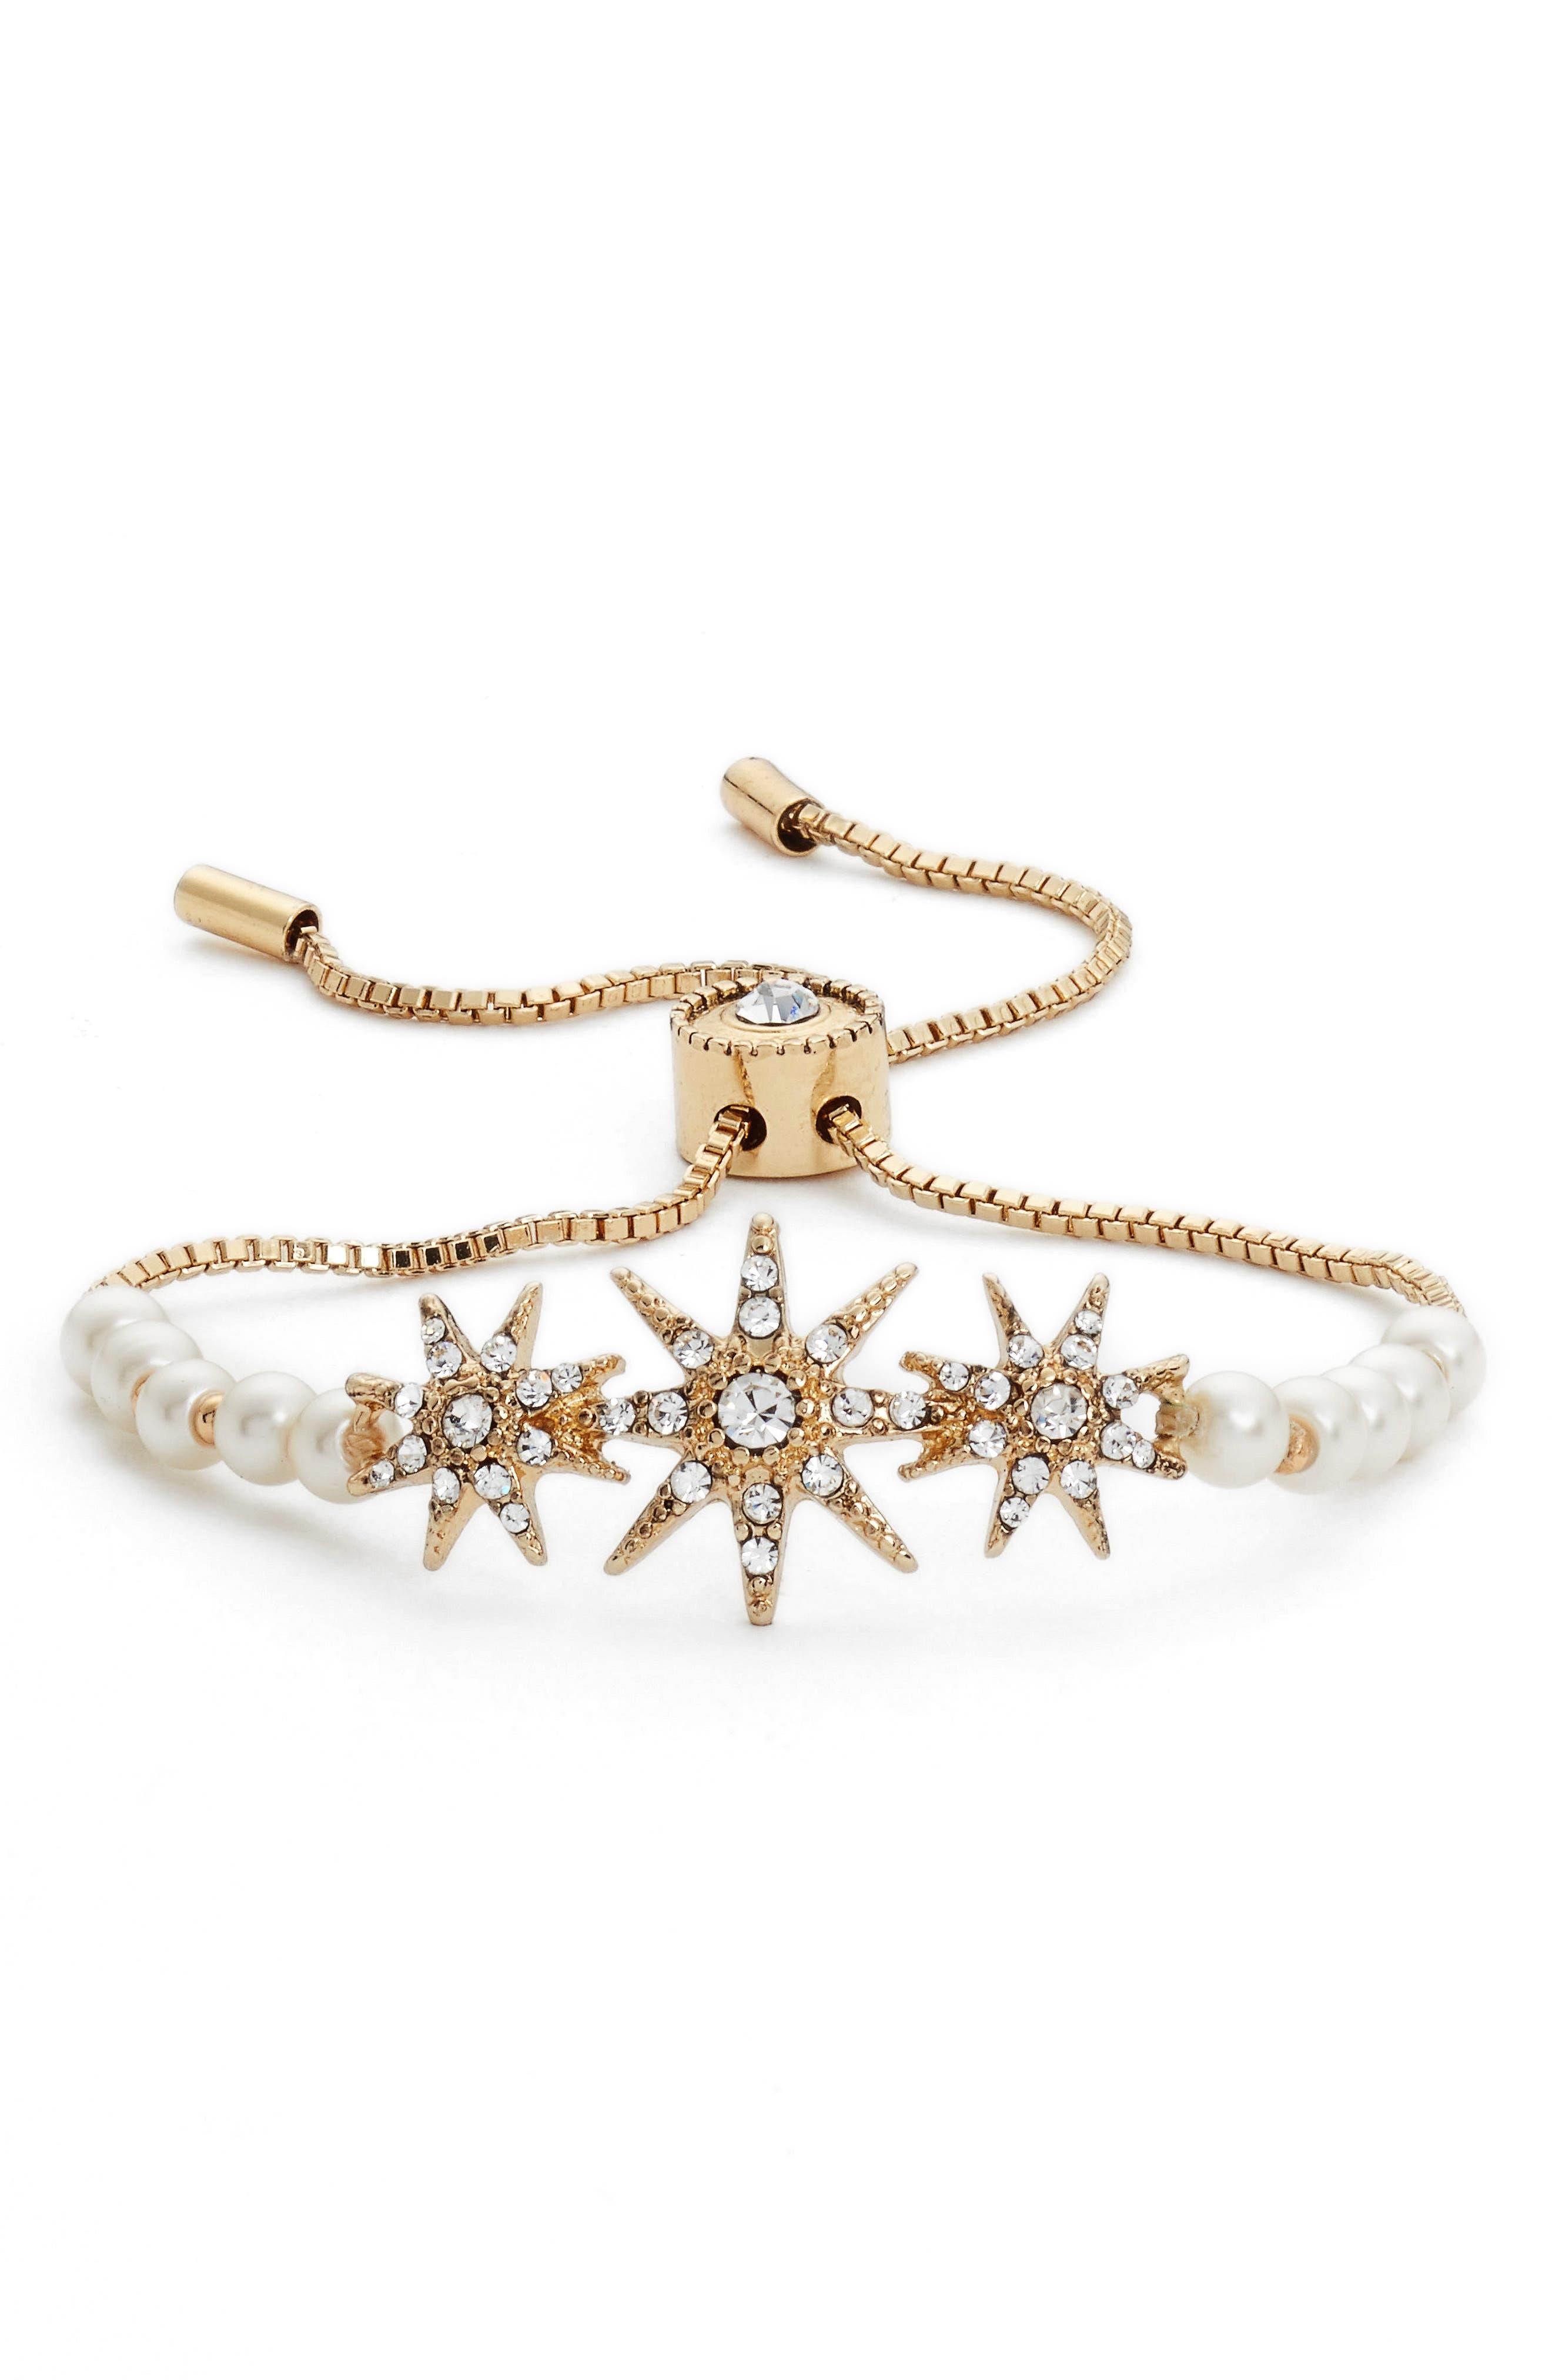 Star Adjustable Bracelet,                         Main,                         color, Pearl/ Cry/ Gold